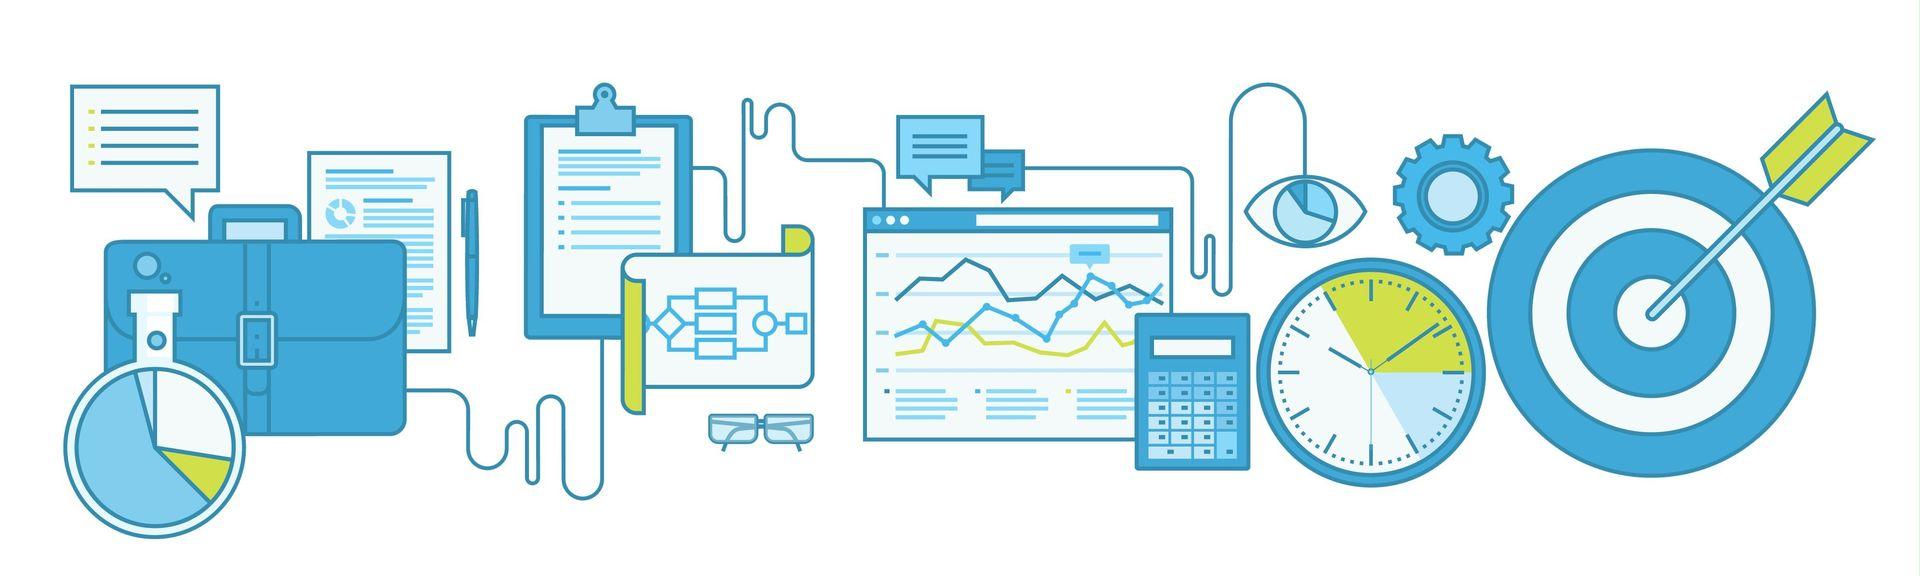 digital-marketing-in-education-digital-marketing